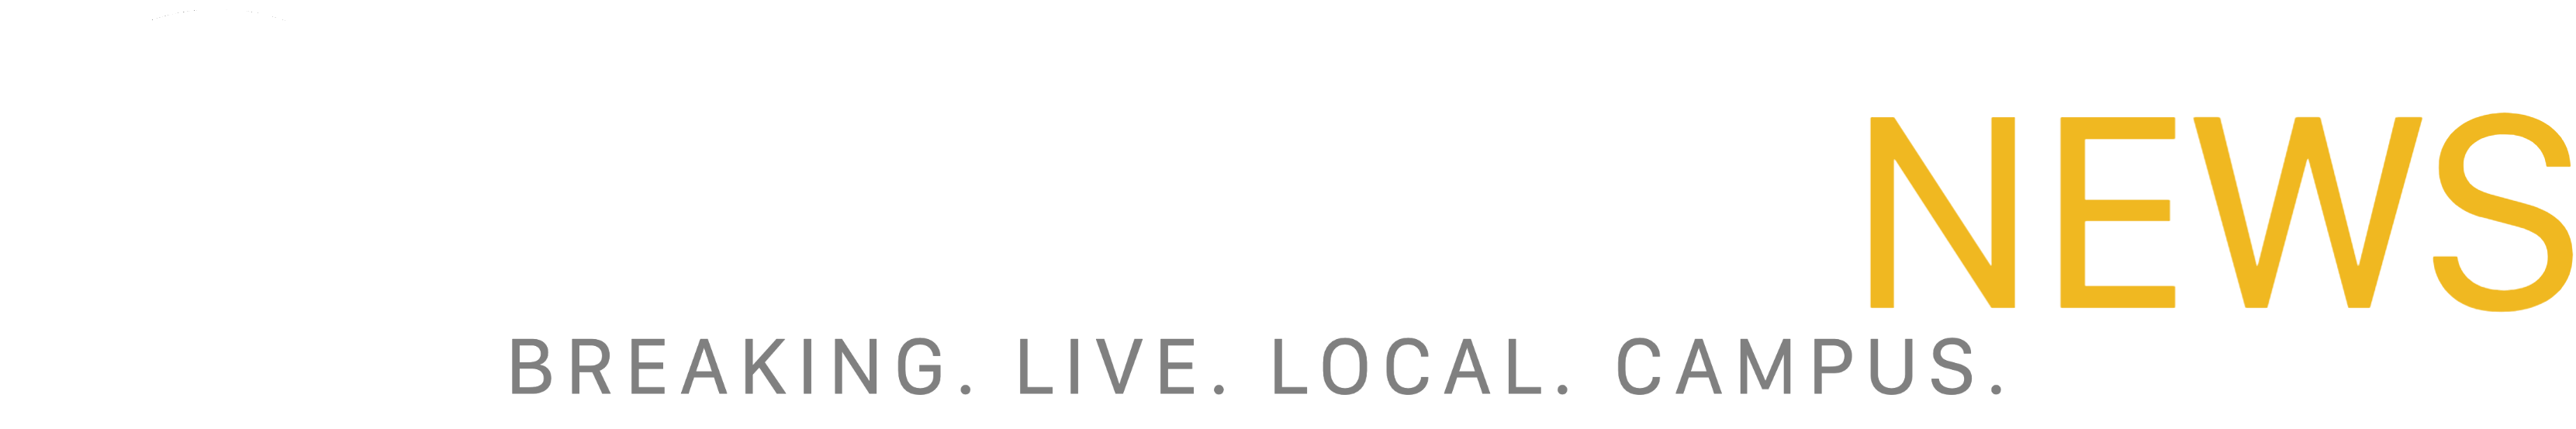 Canyons News